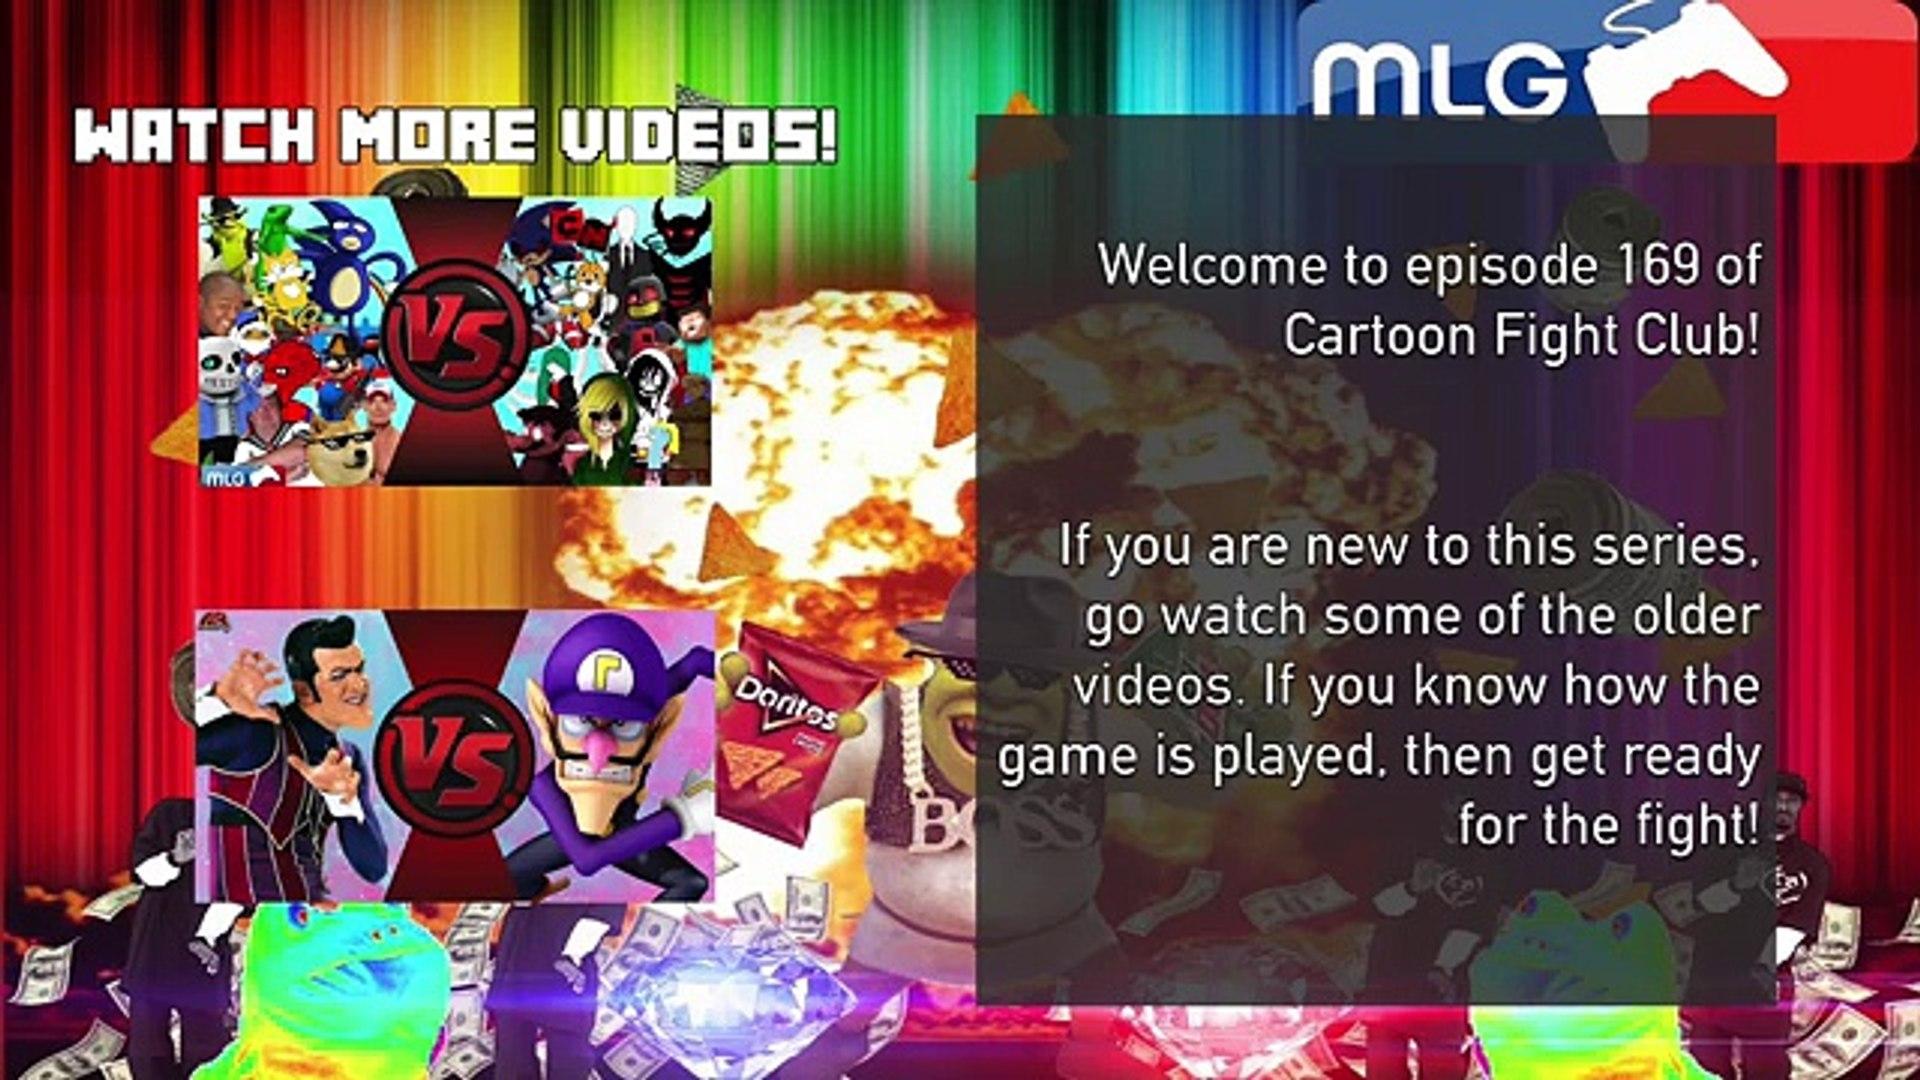 SANIC vs SANESS! (MLG vs Undertale Meme) Cartoon Fight Club Episode 169!